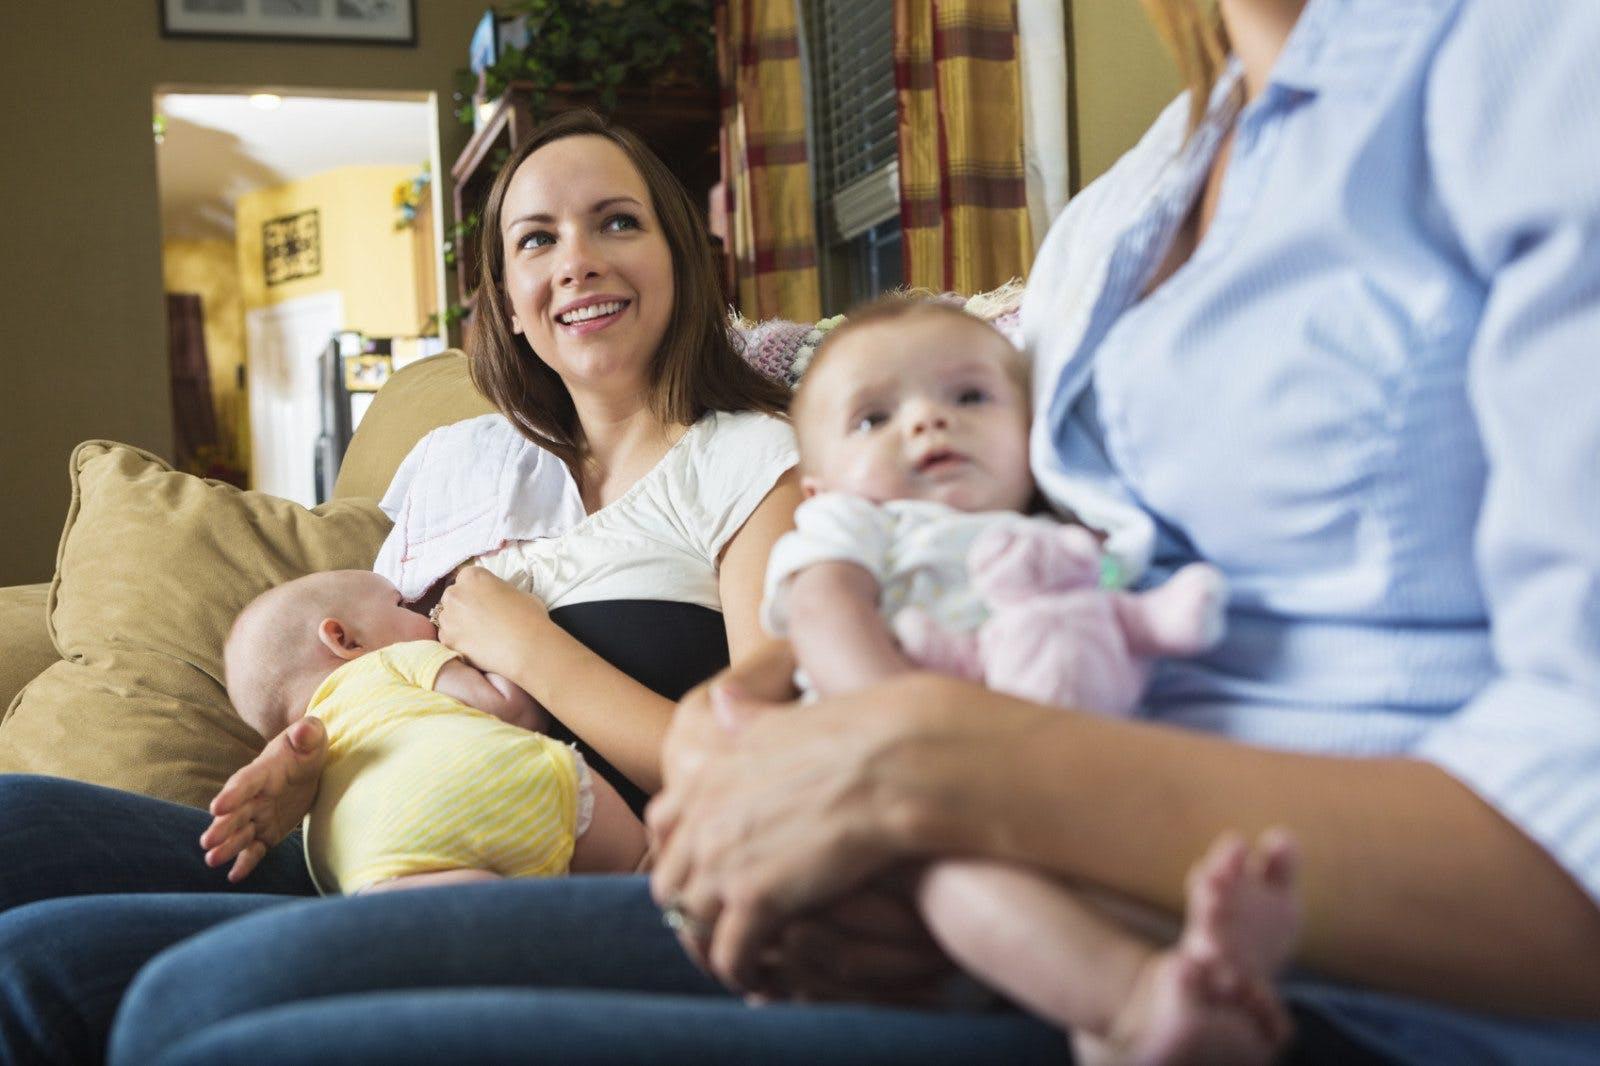 Breastfeeding on a low-carb diet - is it dangerous?